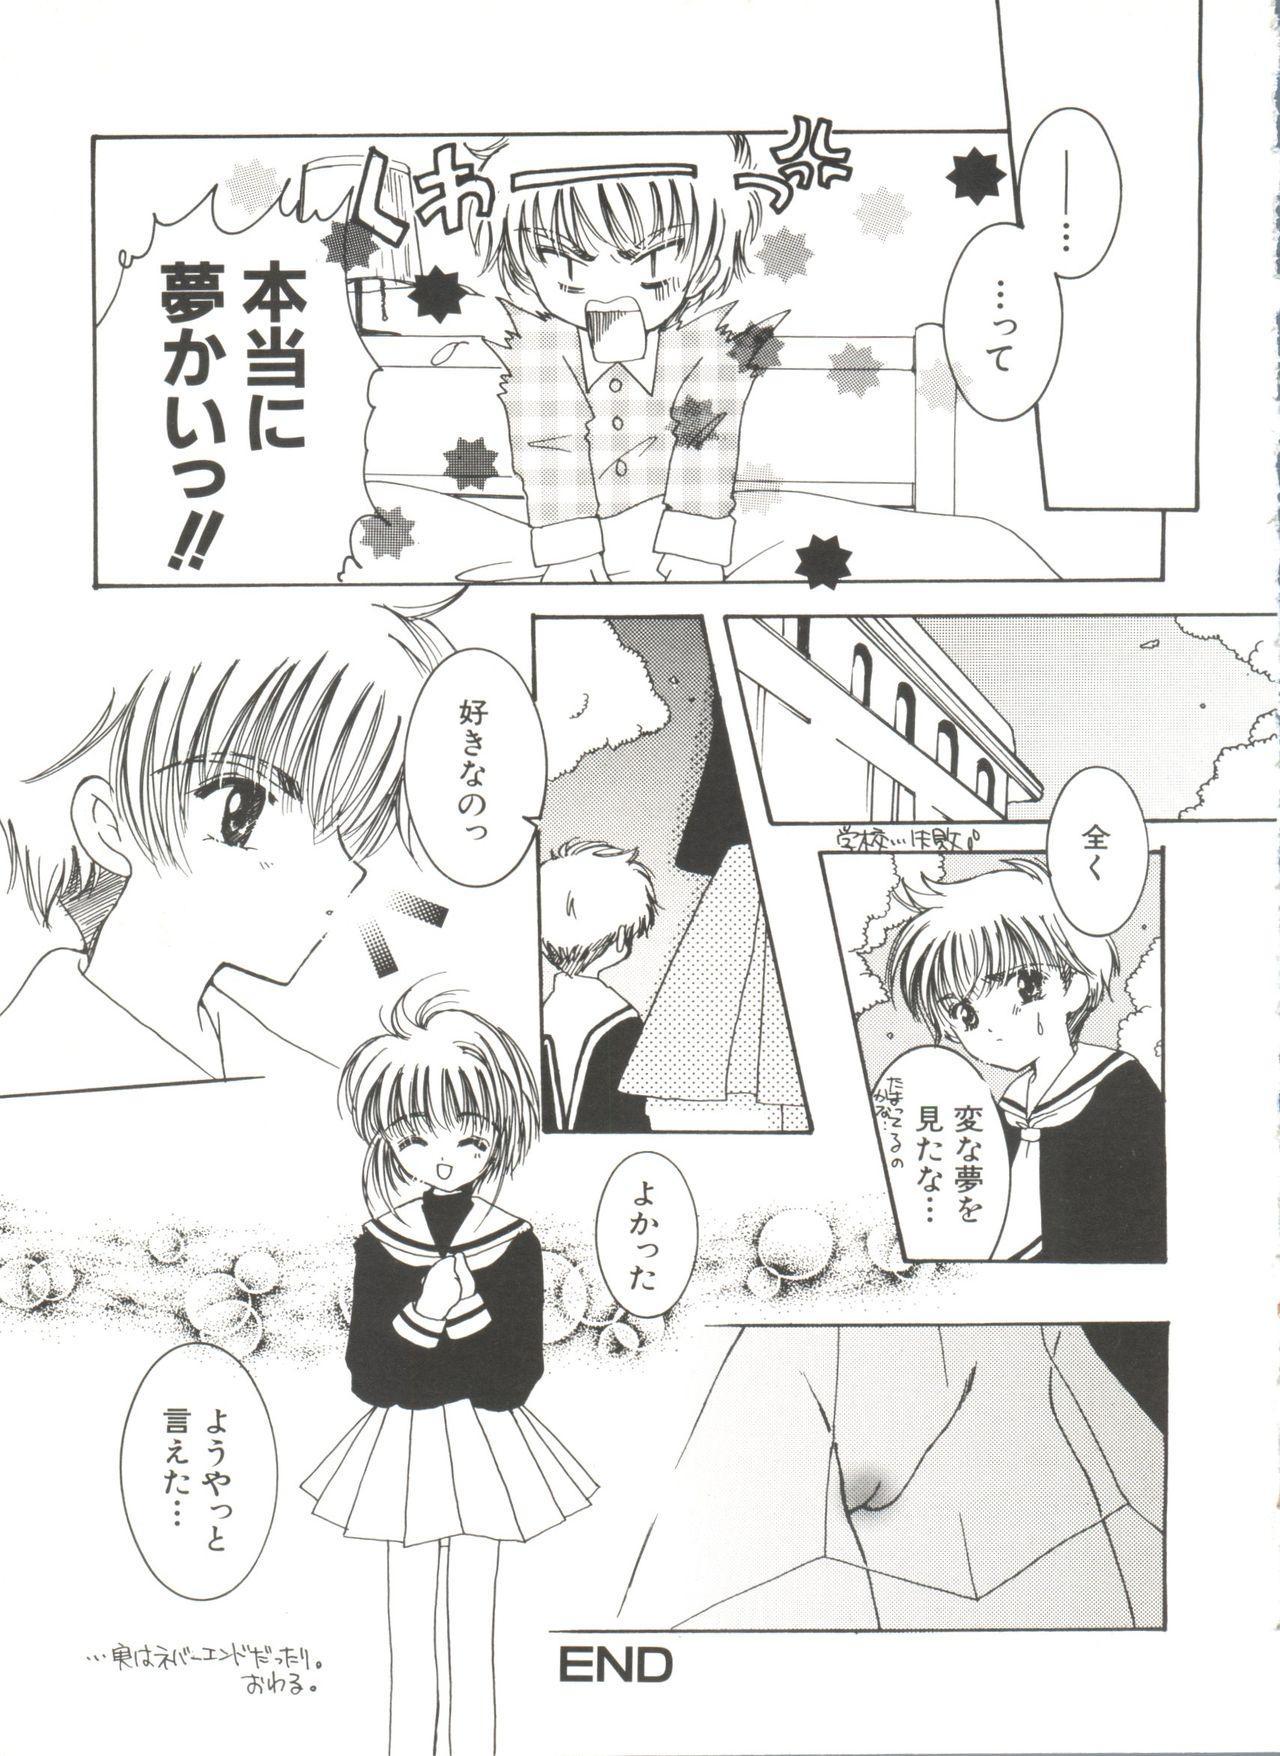 [Anthology] Denei Tamatebako 8 - Utakata no Tenshi-tachi II (Various) 64